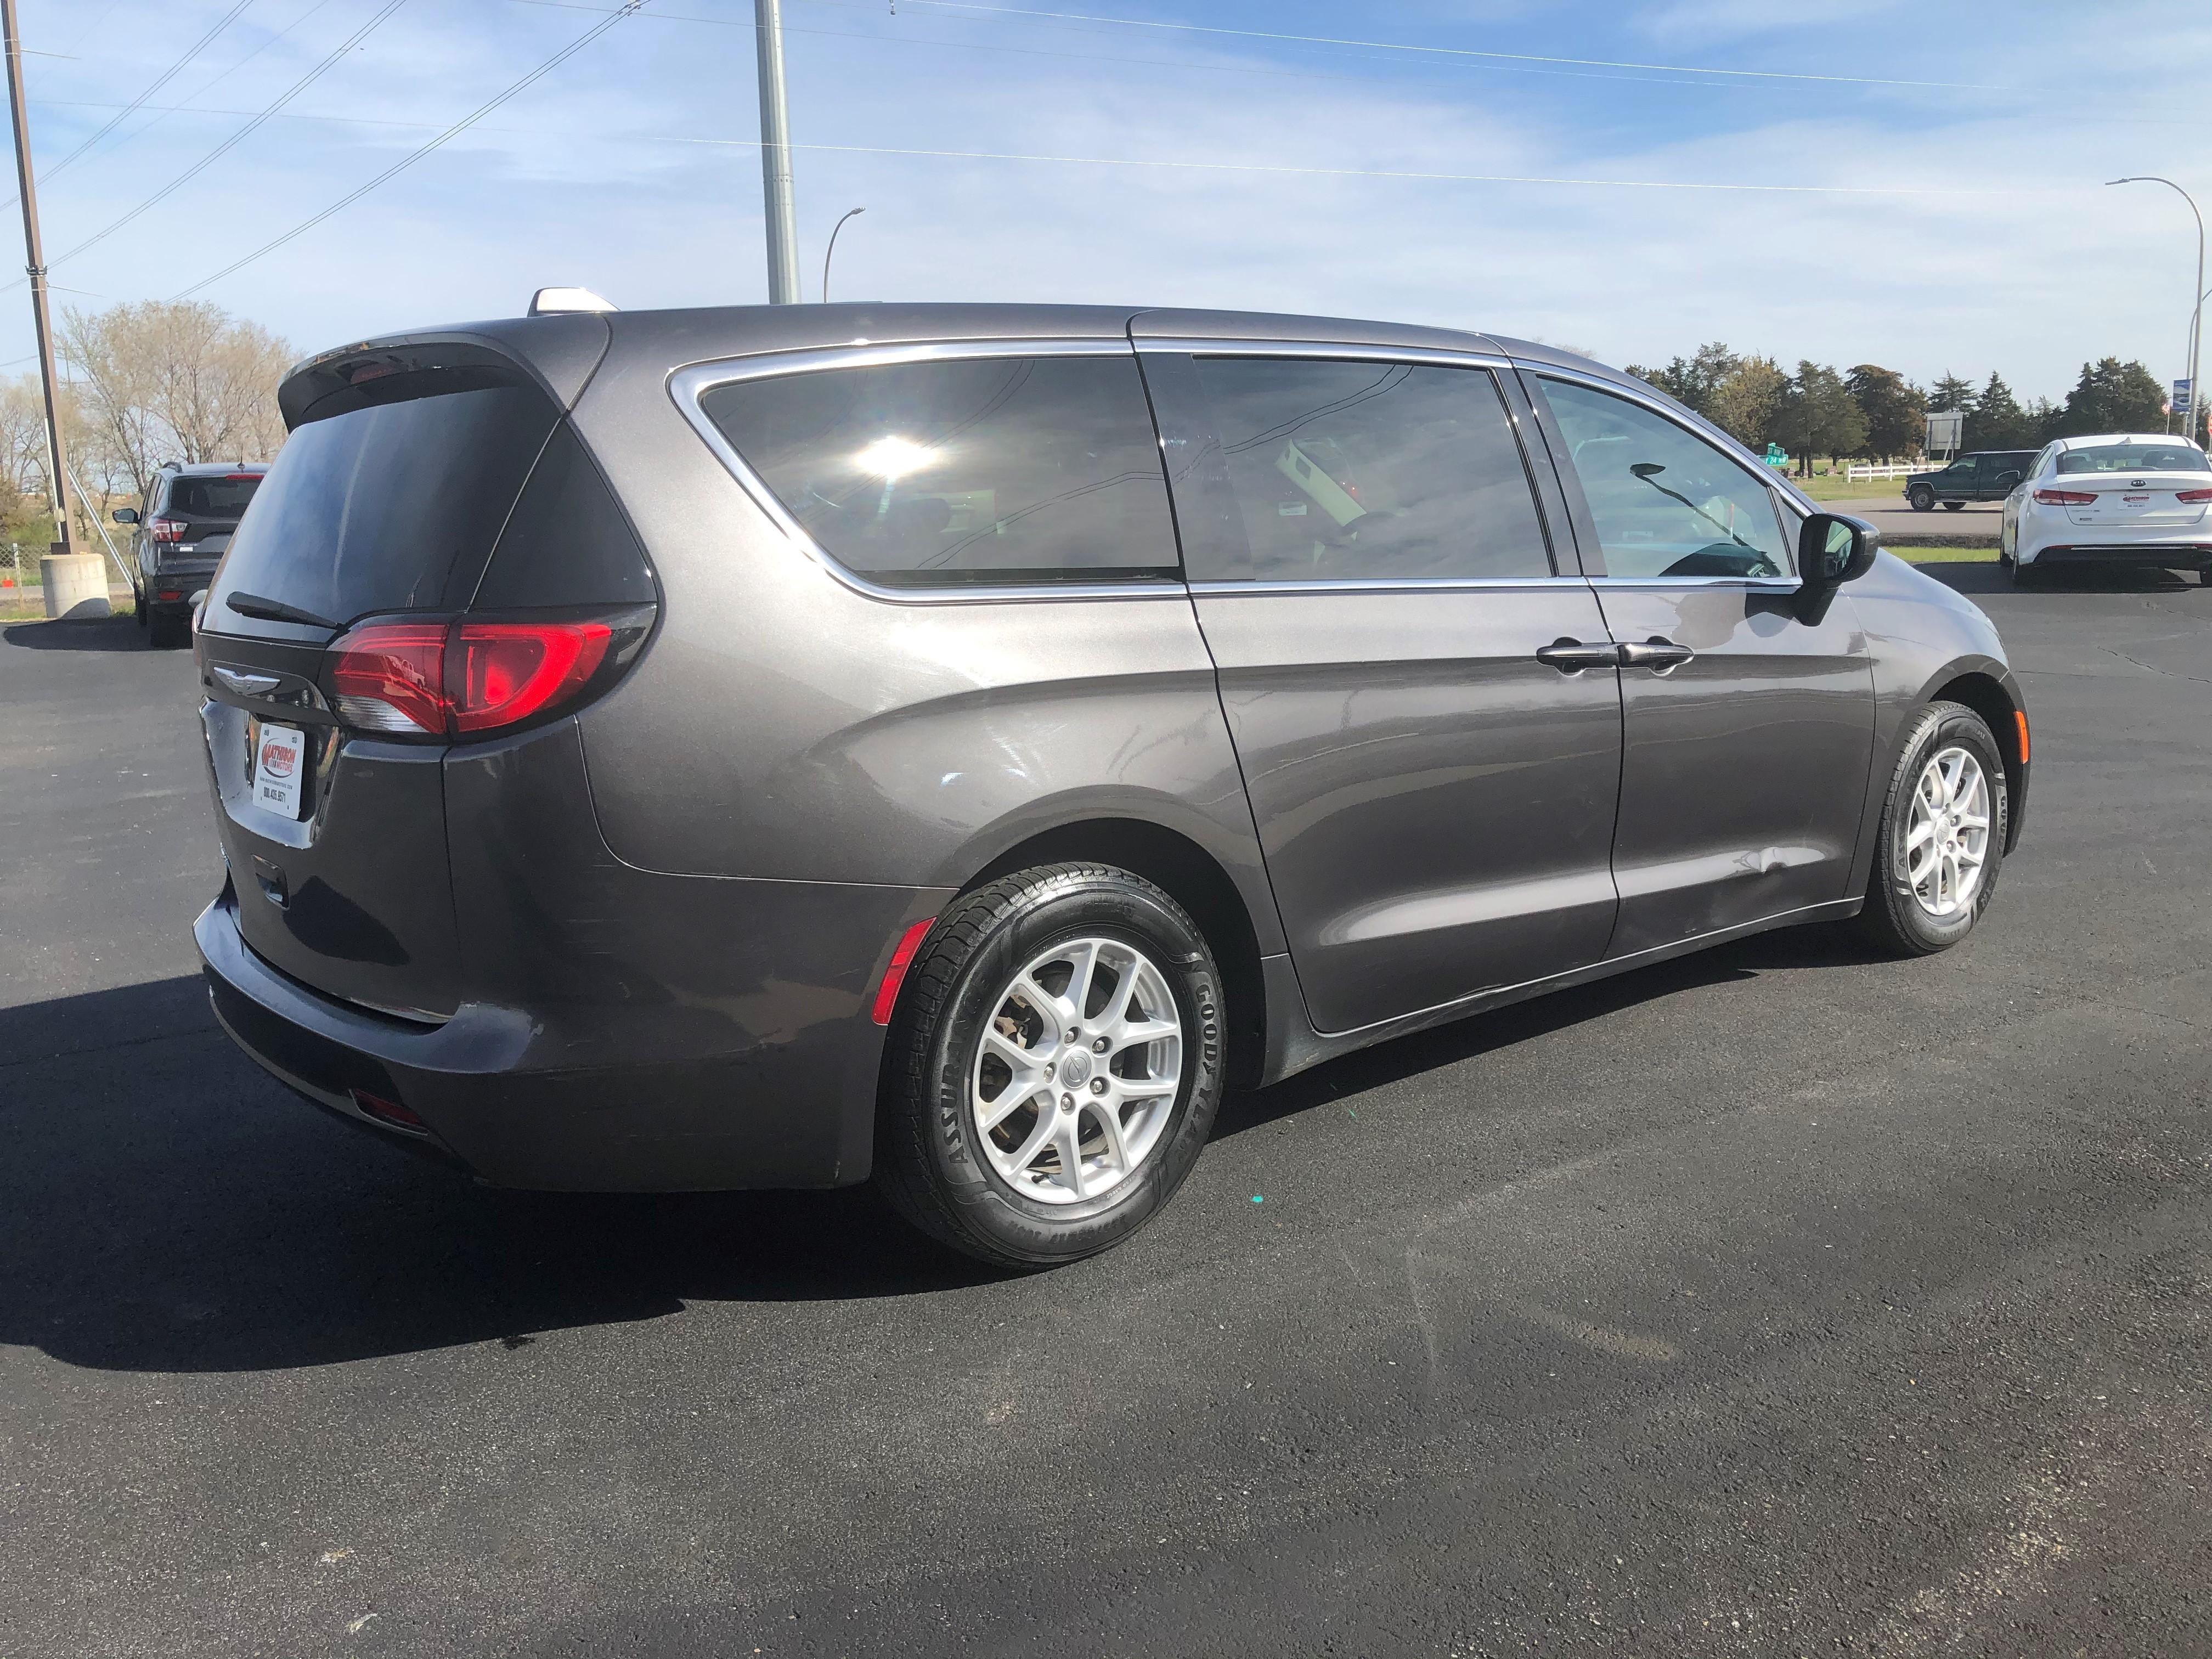 used vehicle - Passenger Van CHRYSLER PACIFICA 2017